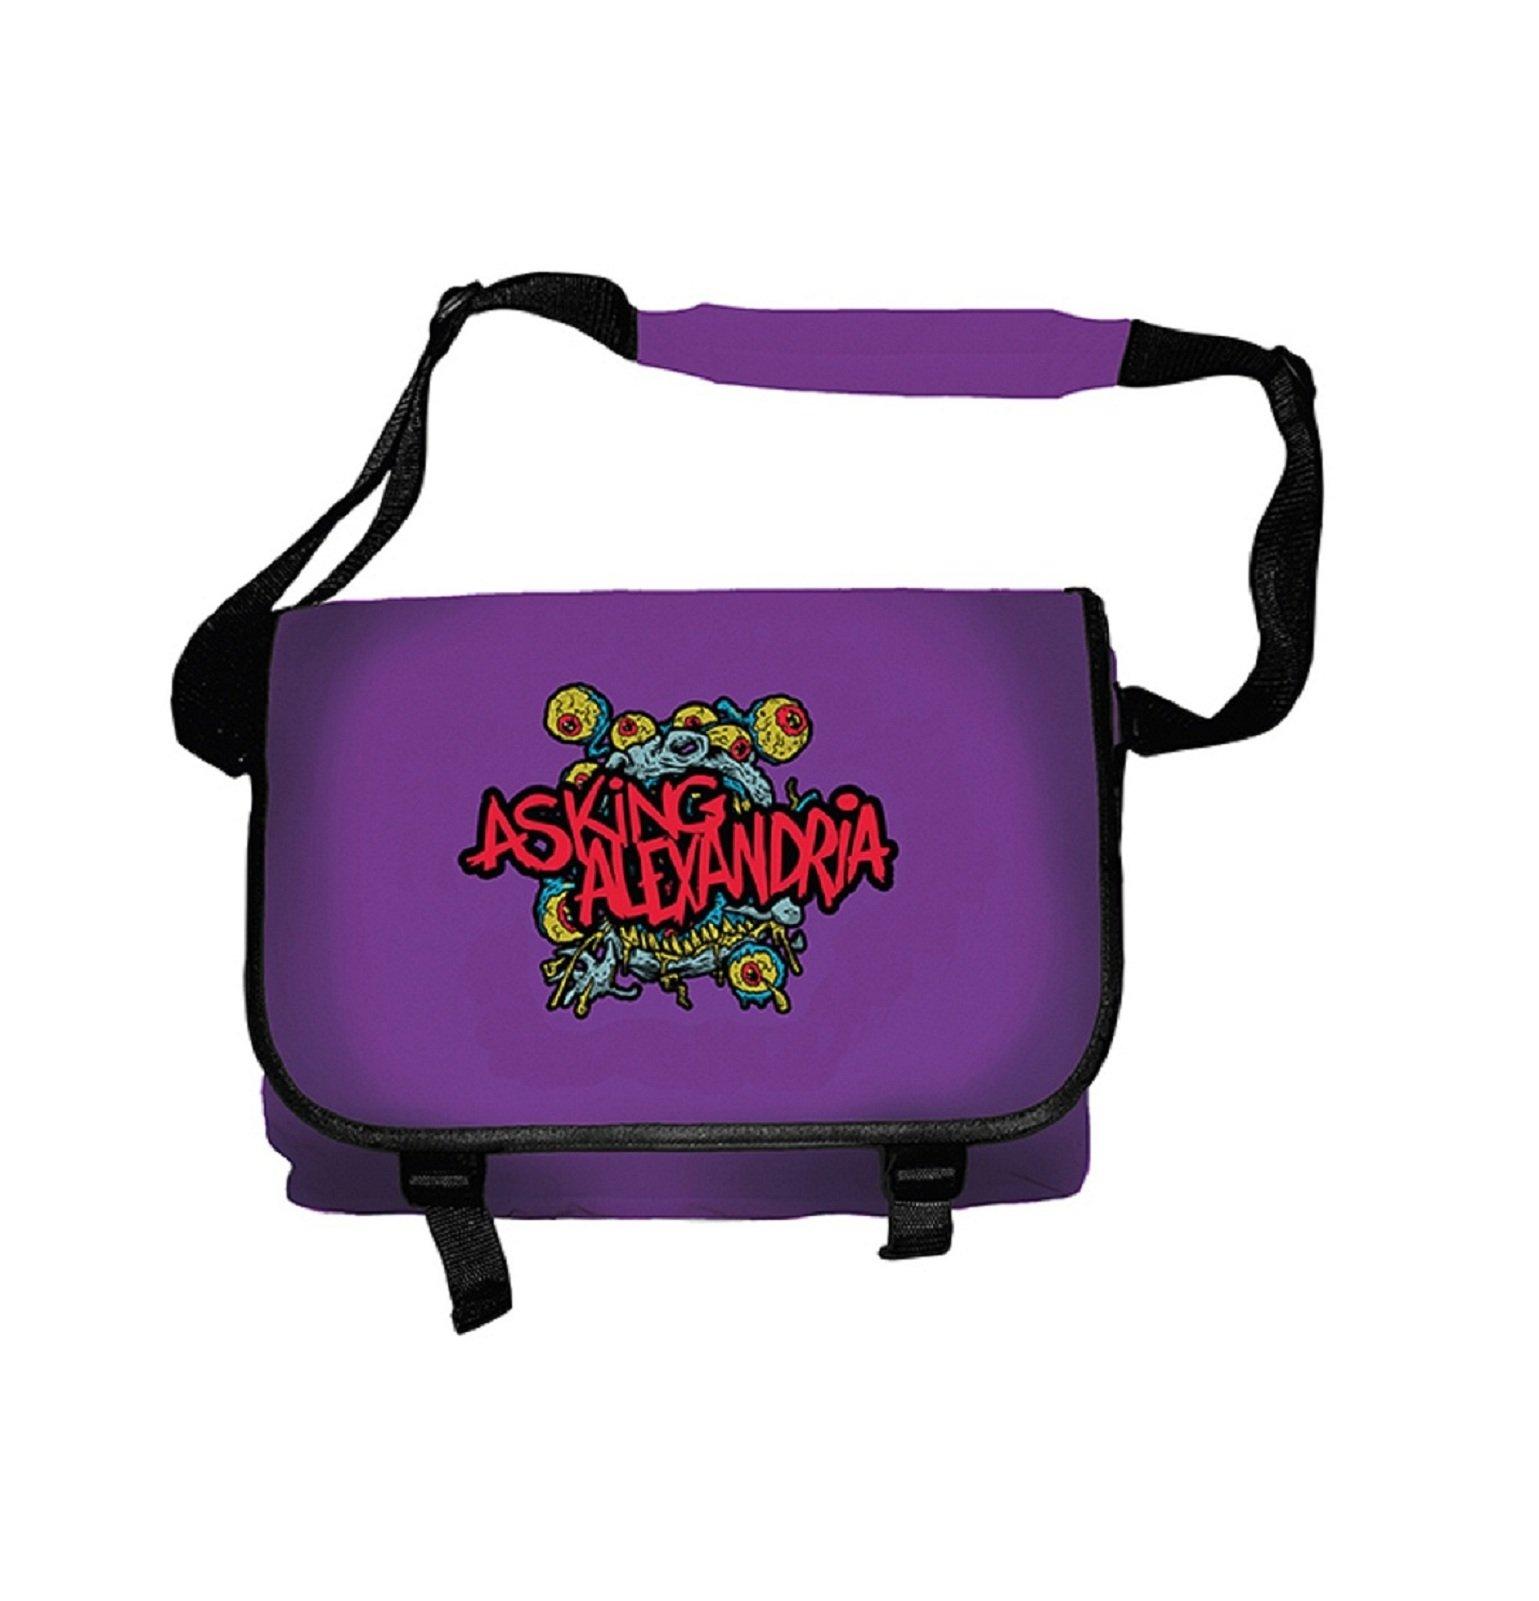 Asking Alexandria Eyeballs Logo Official Messenger Bag